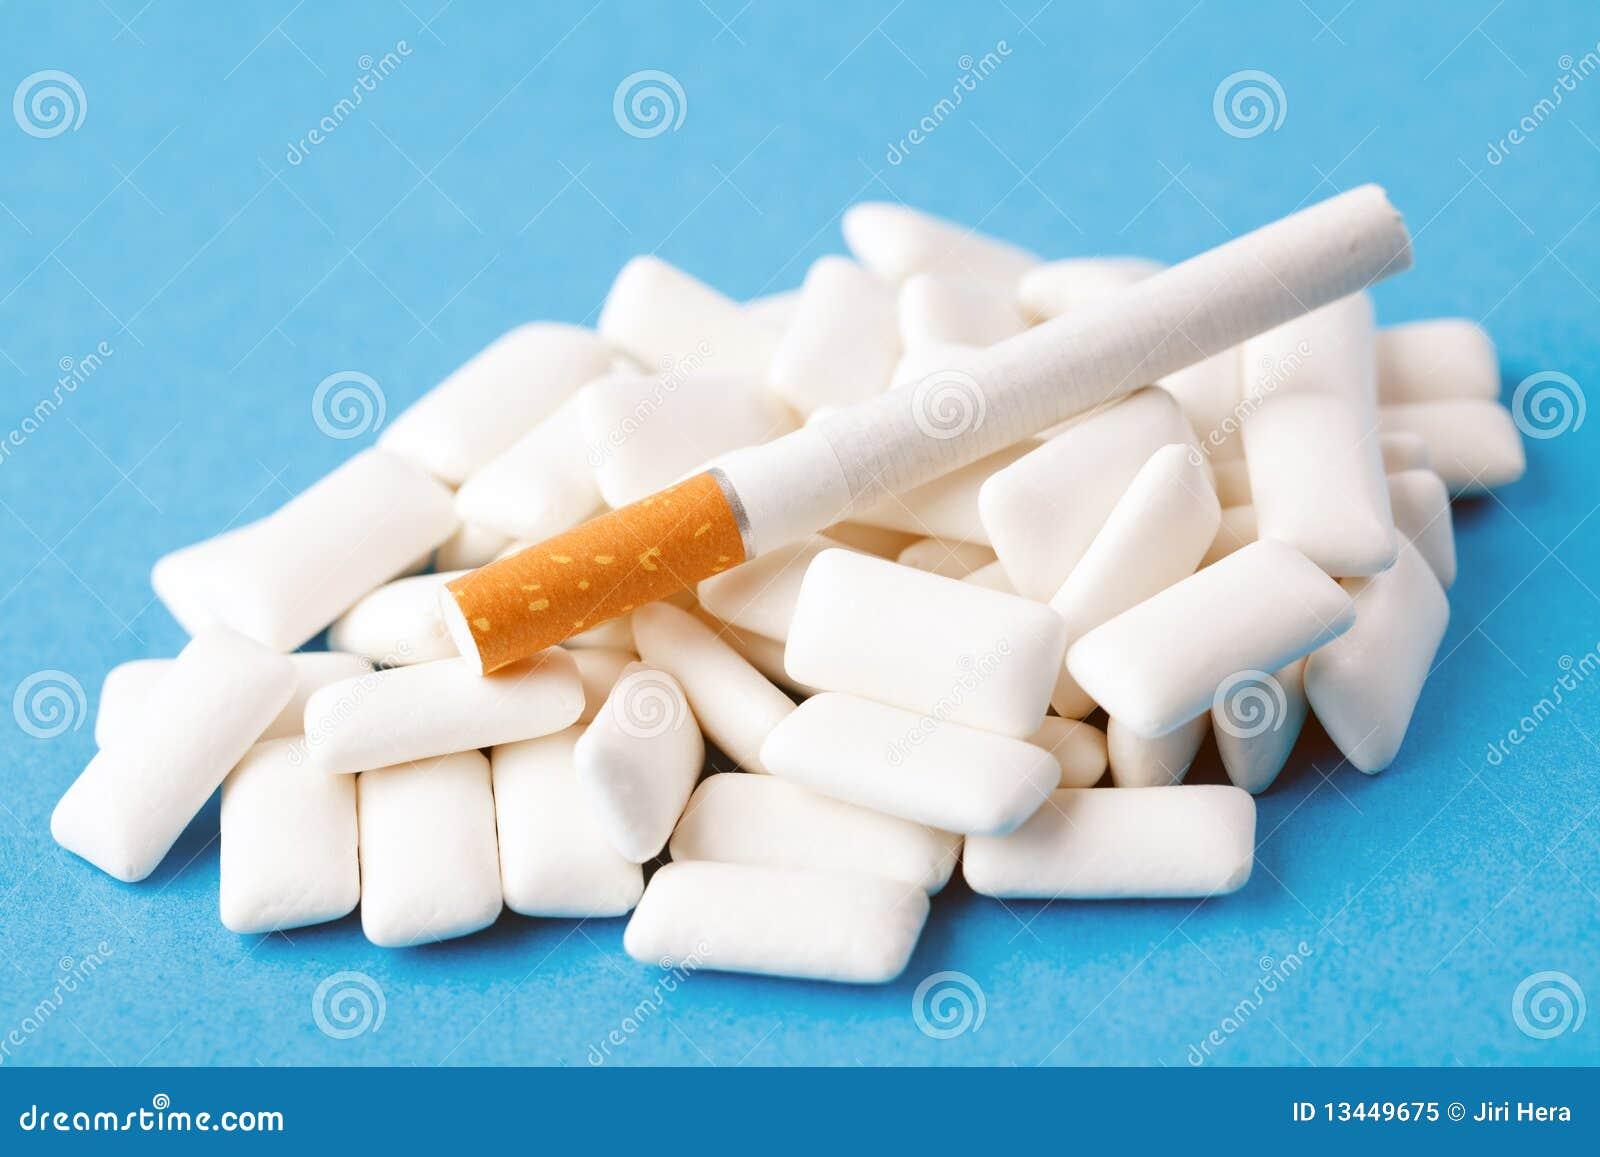 Kaugummis und Zigarette